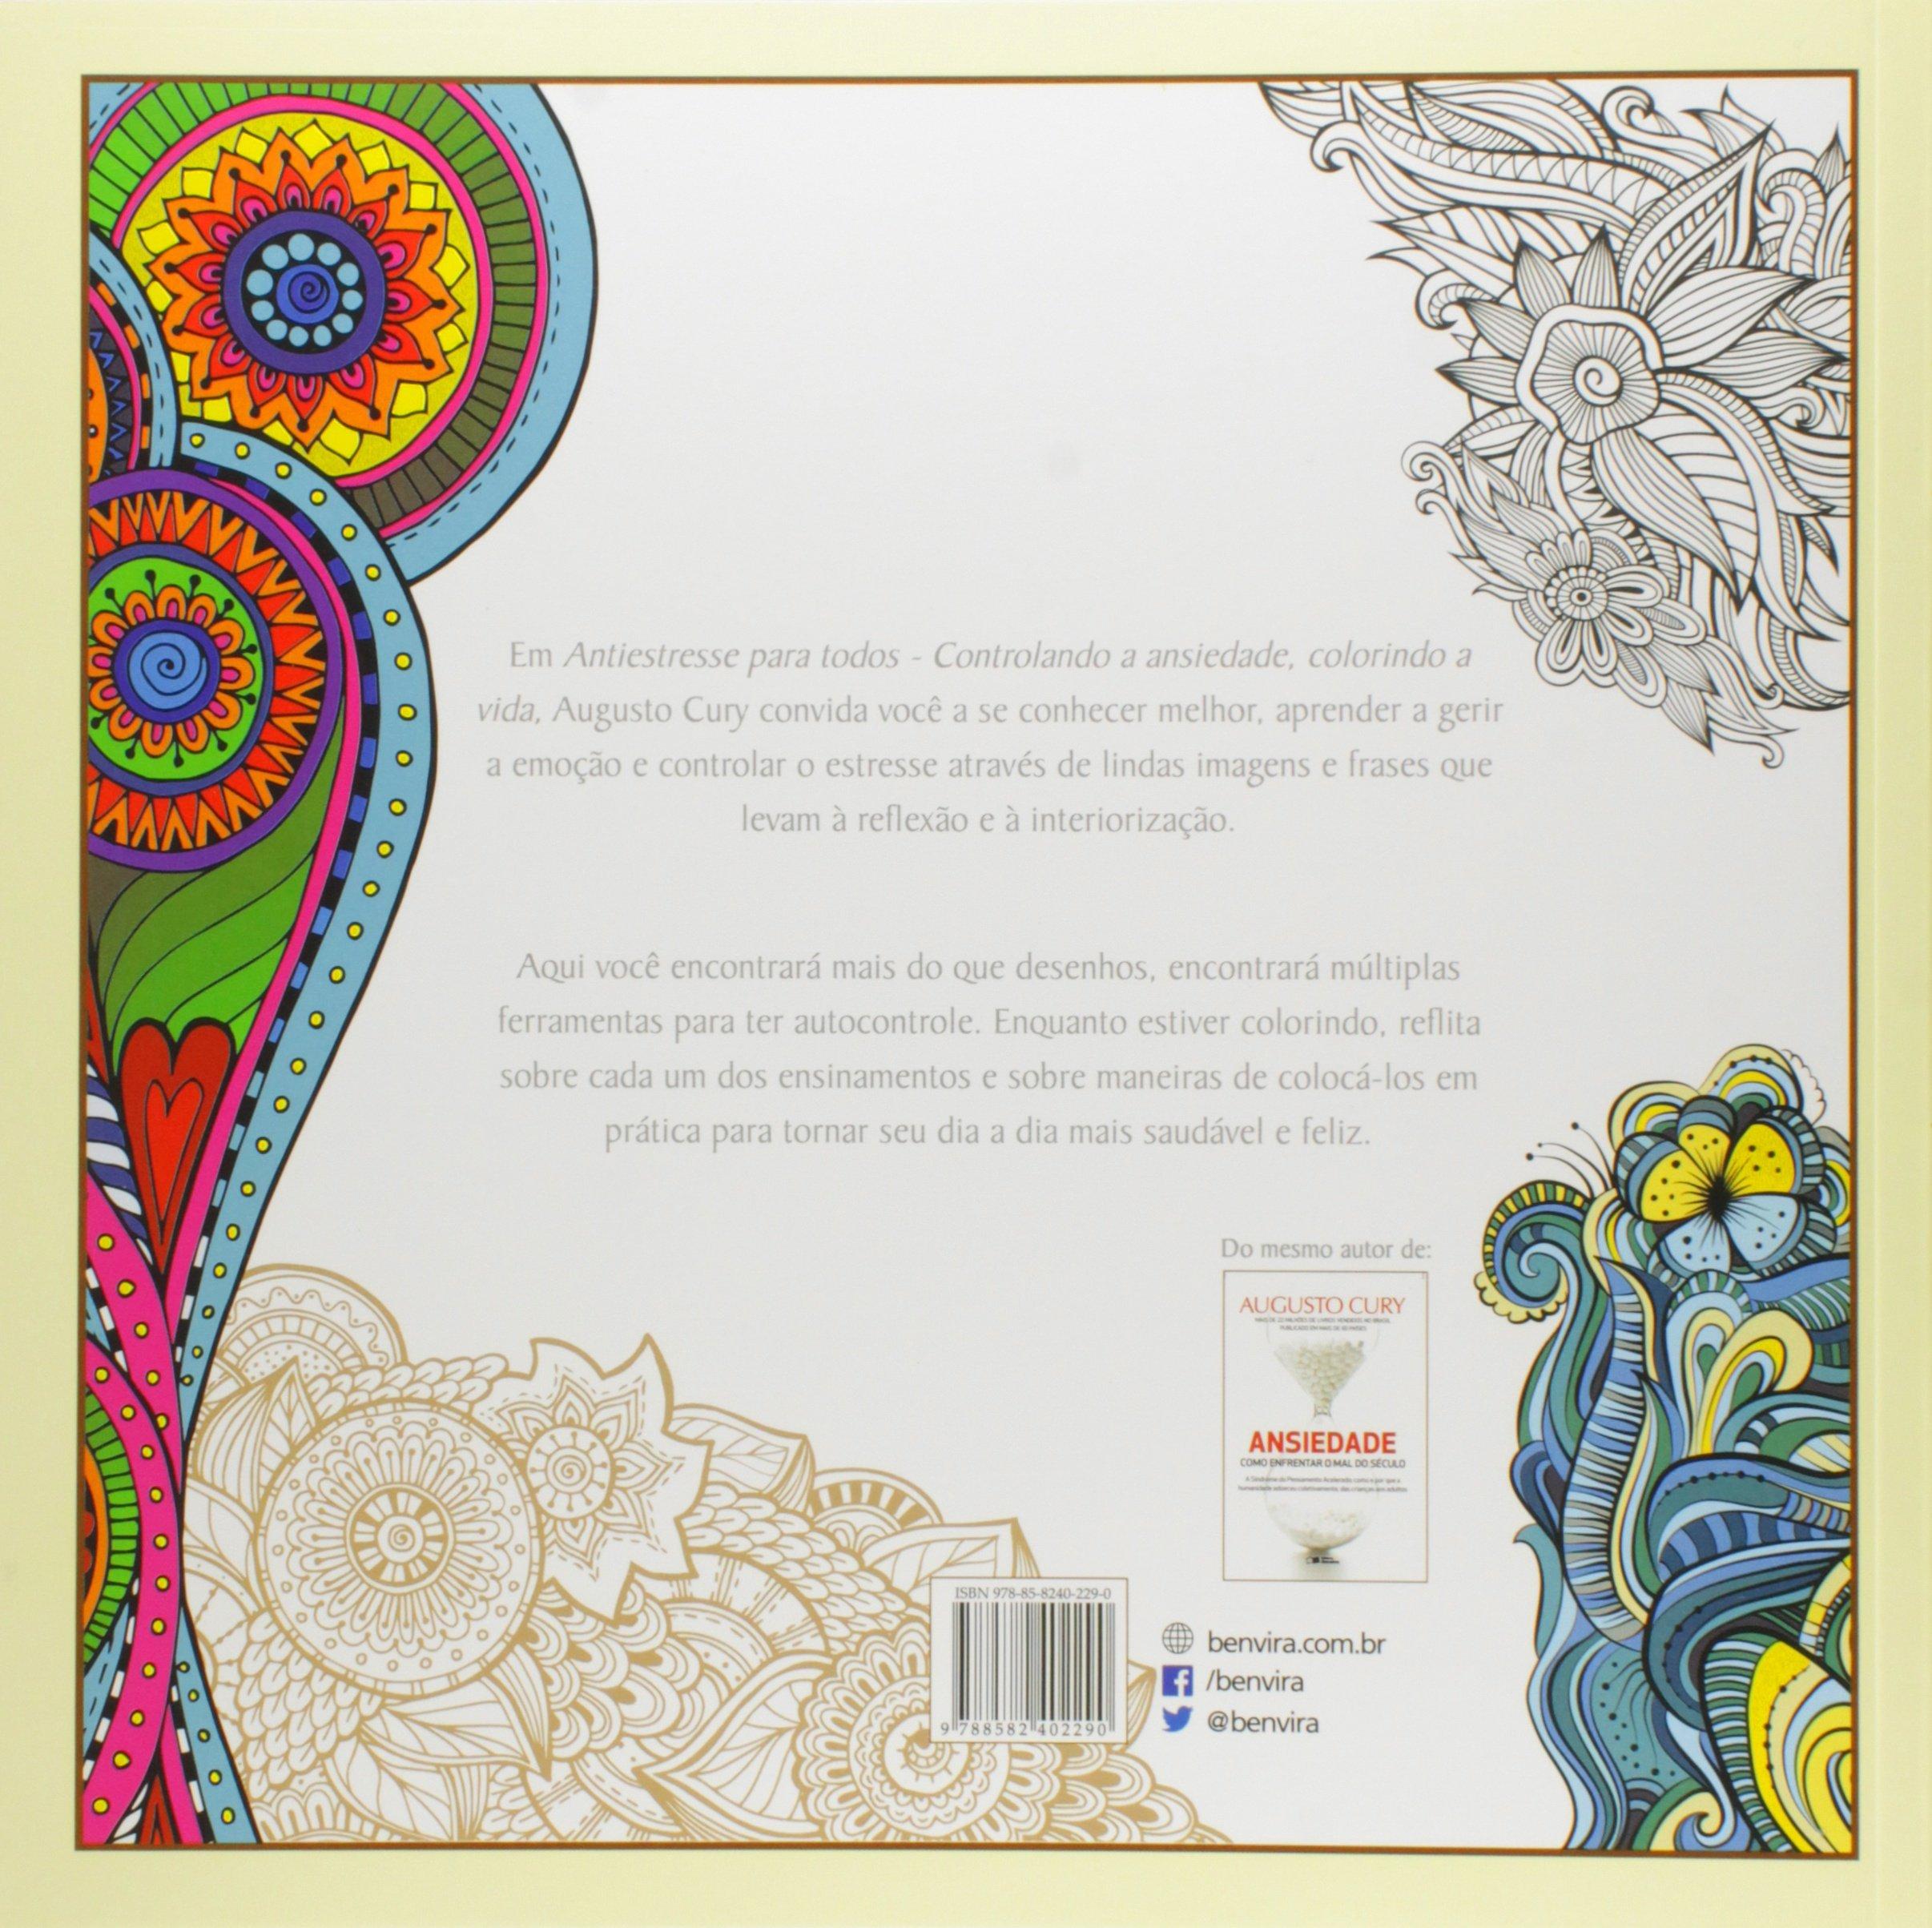 Antiestresse Para Todos Controlando A Ansiedade Colorindo